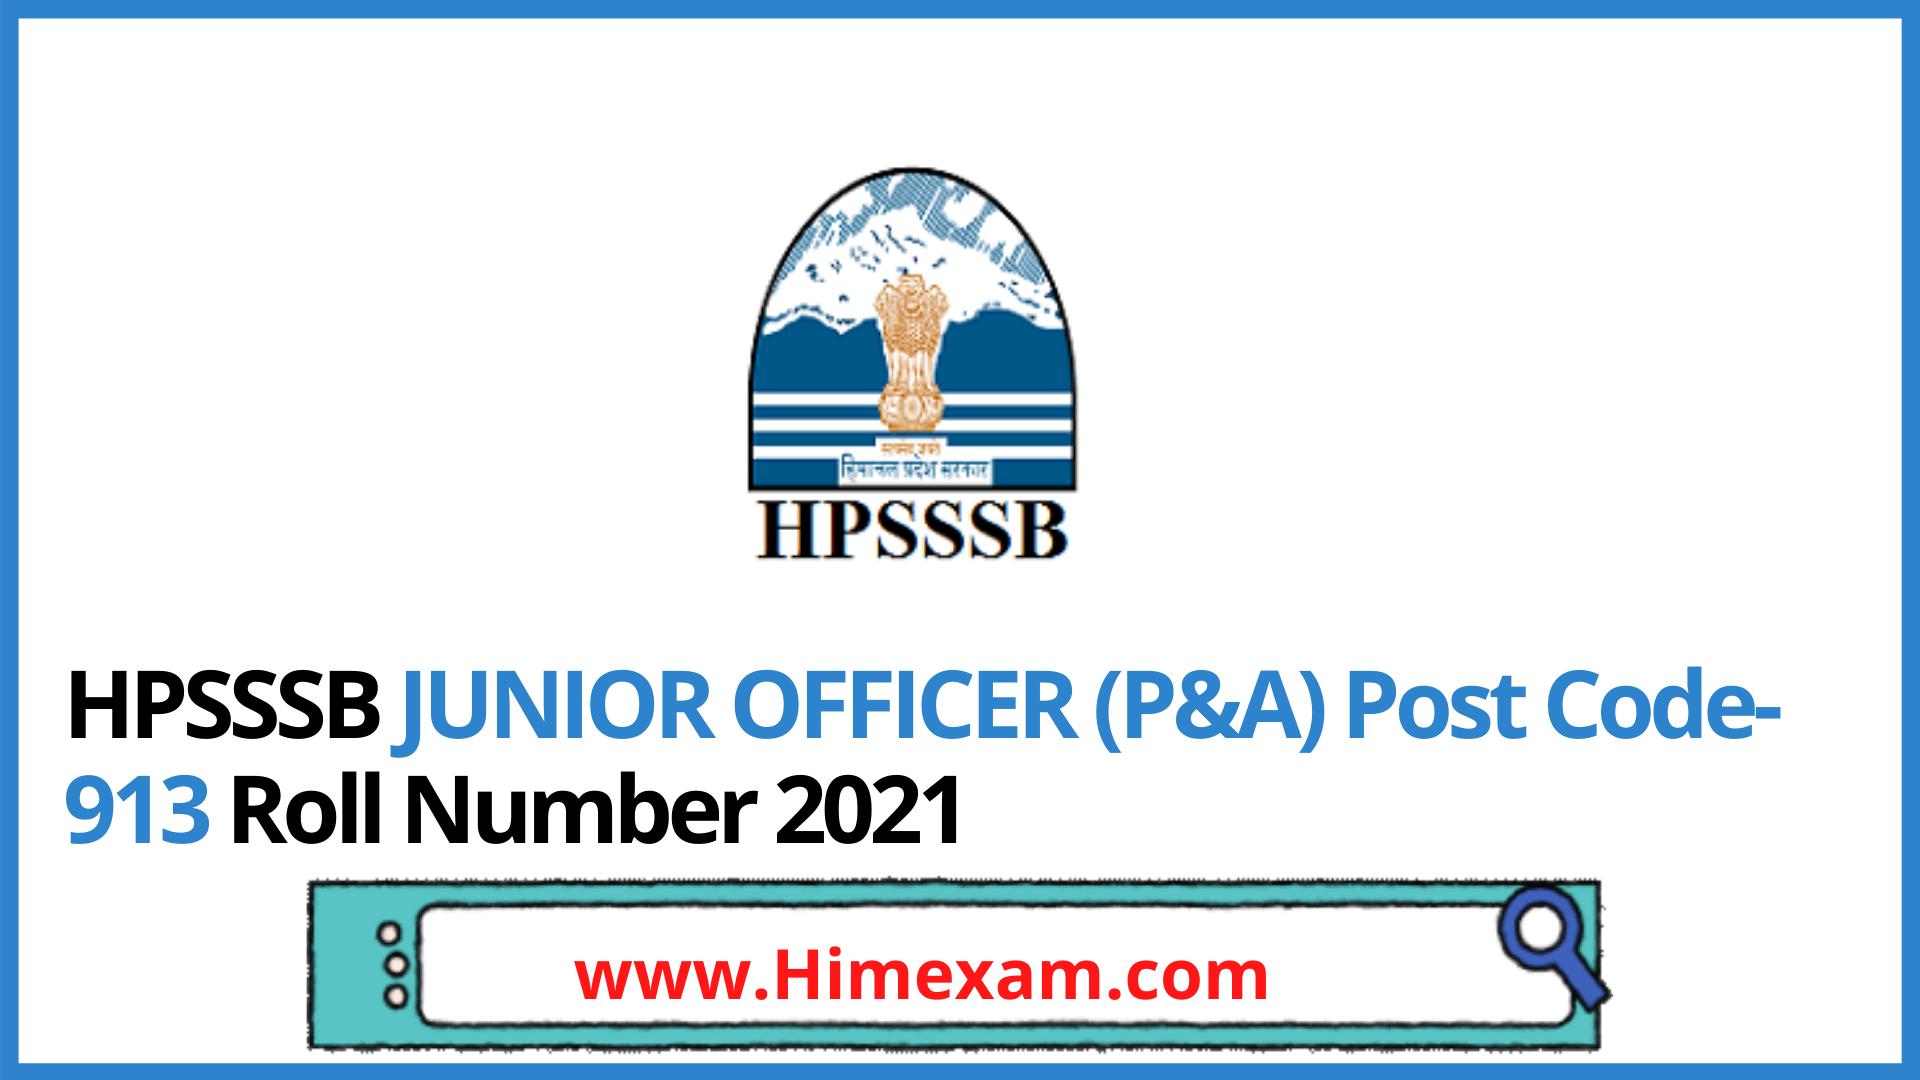 HPSSSB JUNIOR OFFICER (P&A) Post Code-913 Roll Number 2021